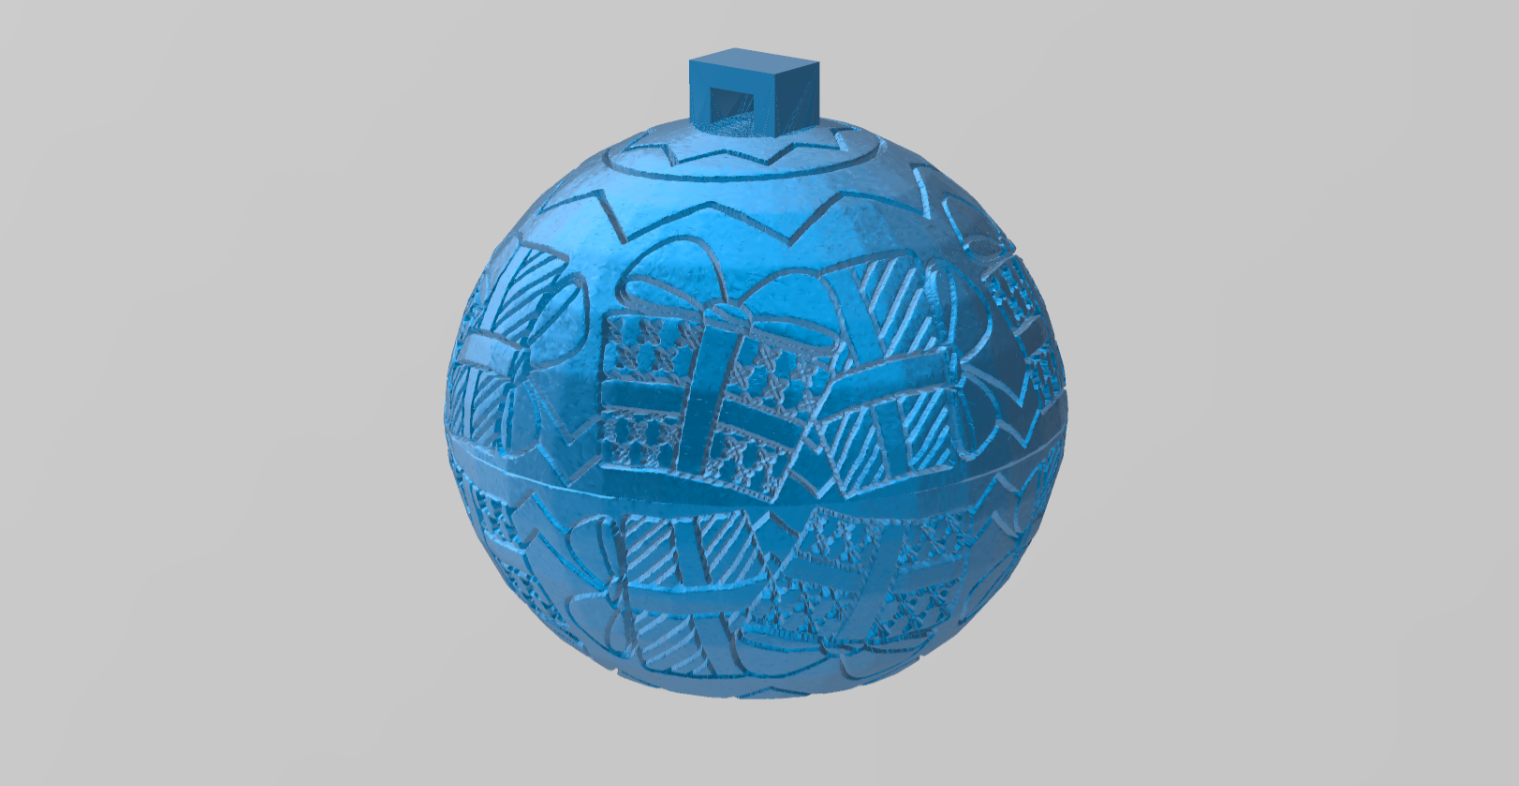 boule de noel 2.png Download free STL file christmas ball 2 • Object to 3D print, Motek3D